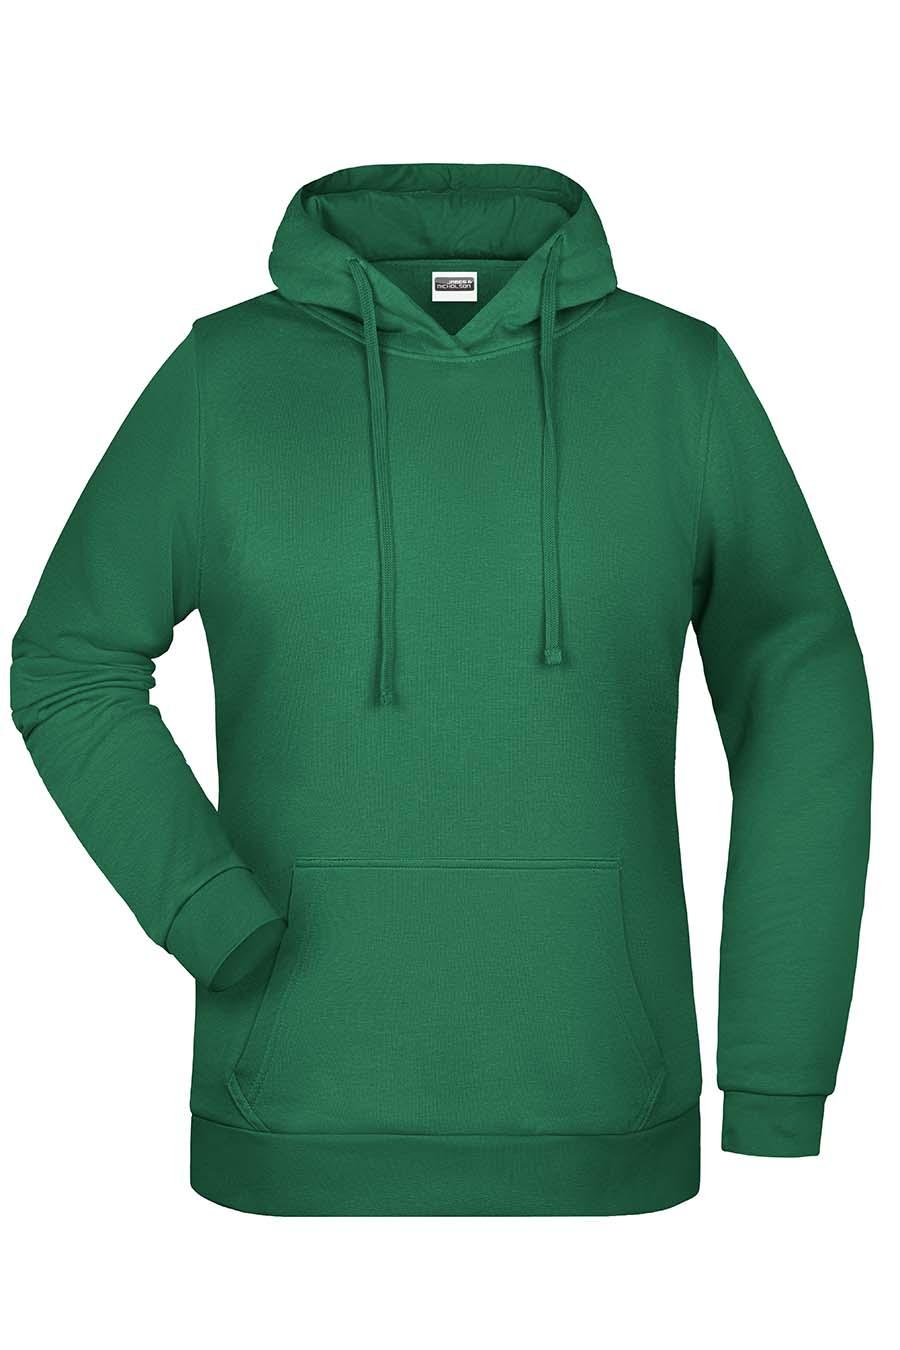 Sweat-shirt capuche femme - 20-1494-10